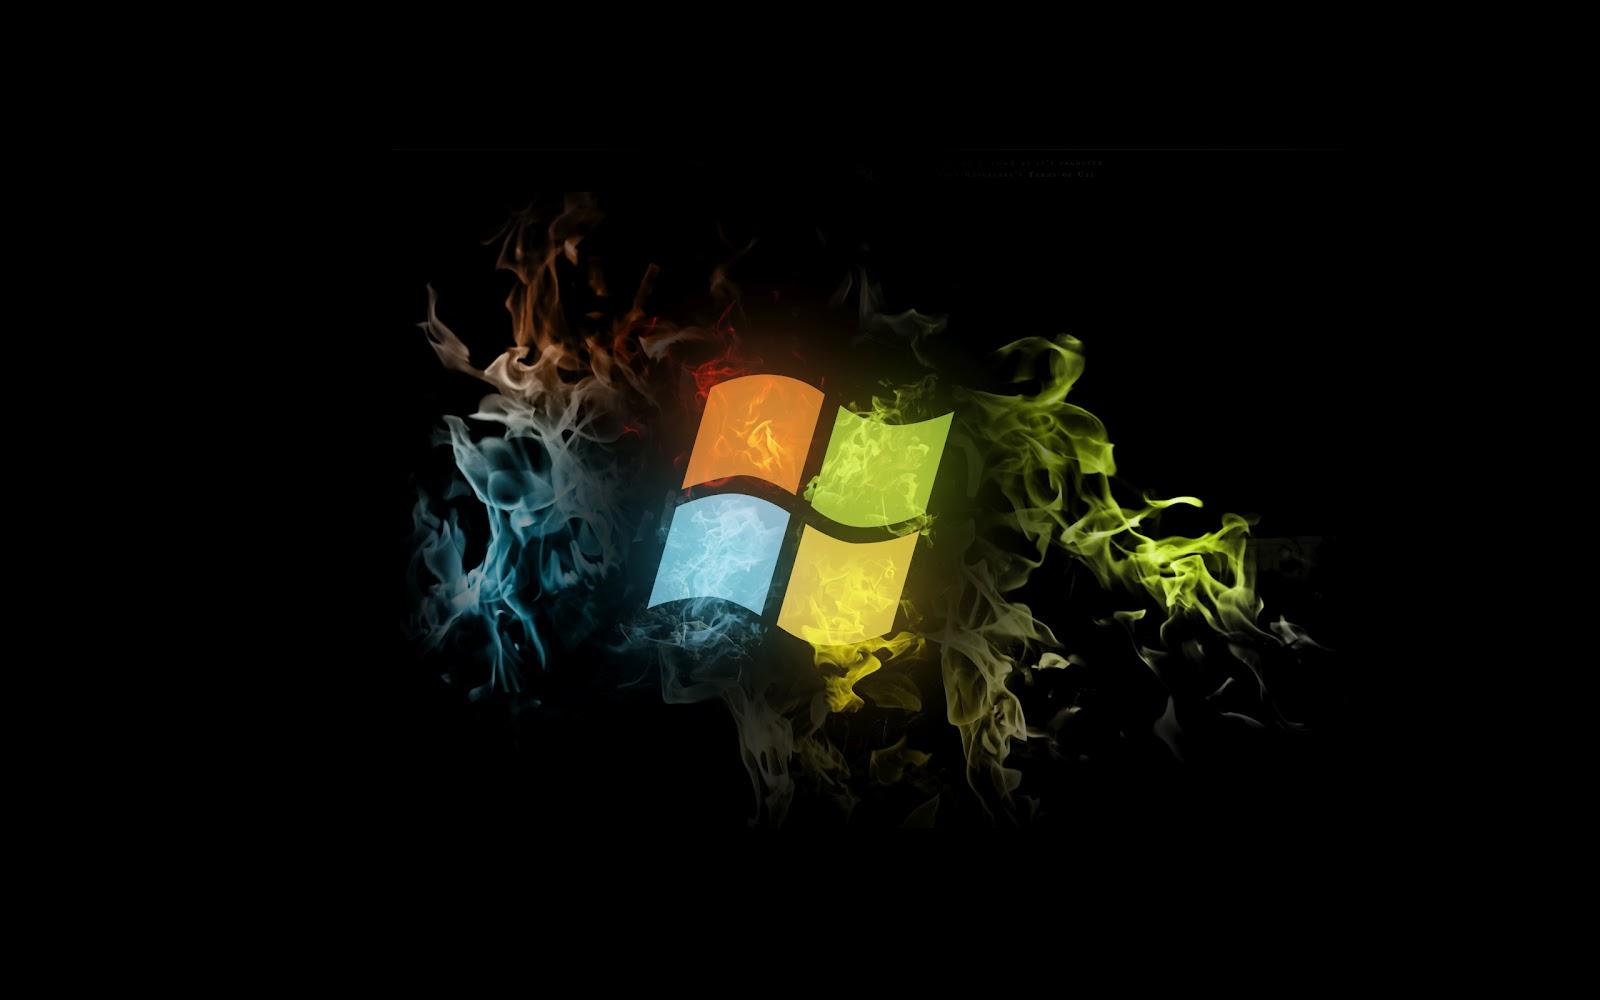 Windows 7 HD Wallpapers Download SEO Urdu Pakistan Blogging 1600x1000